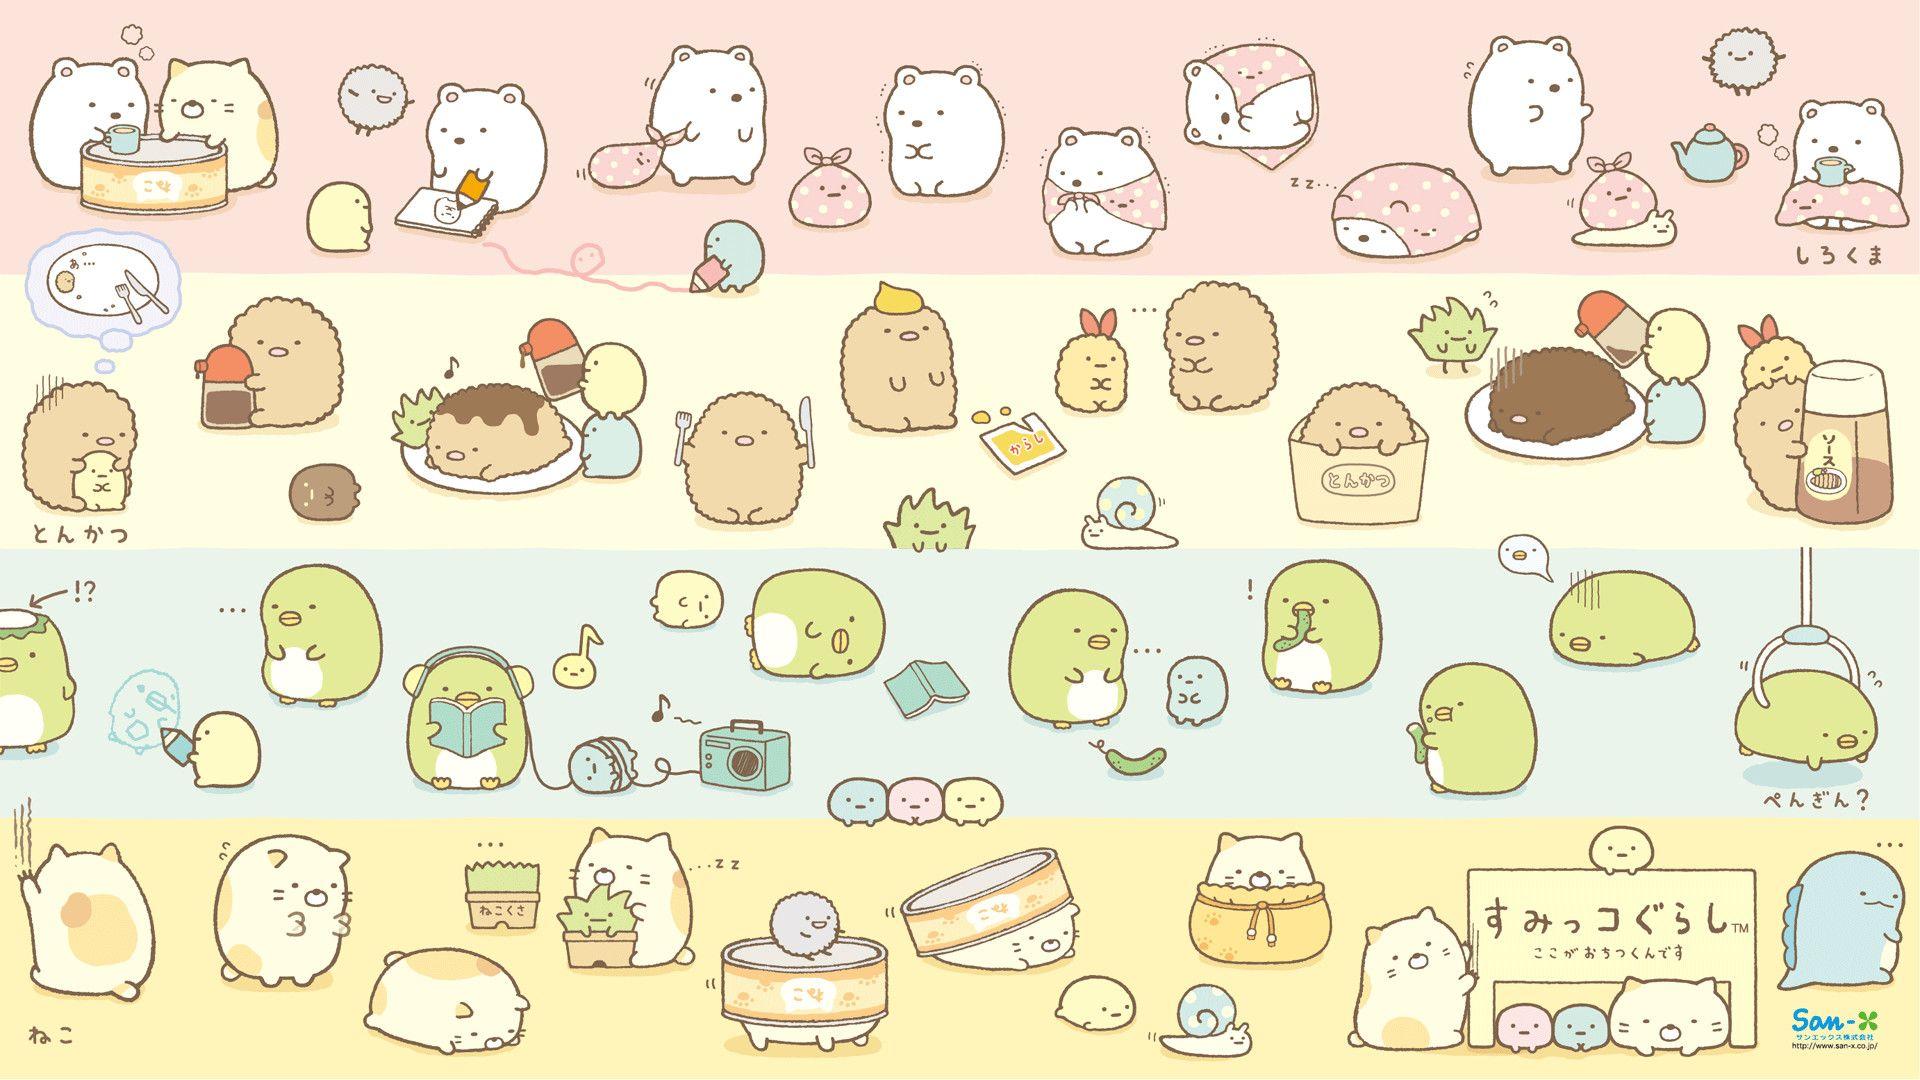 1920x1080 cute San X wallpaper collection 2013 Rilakkuma